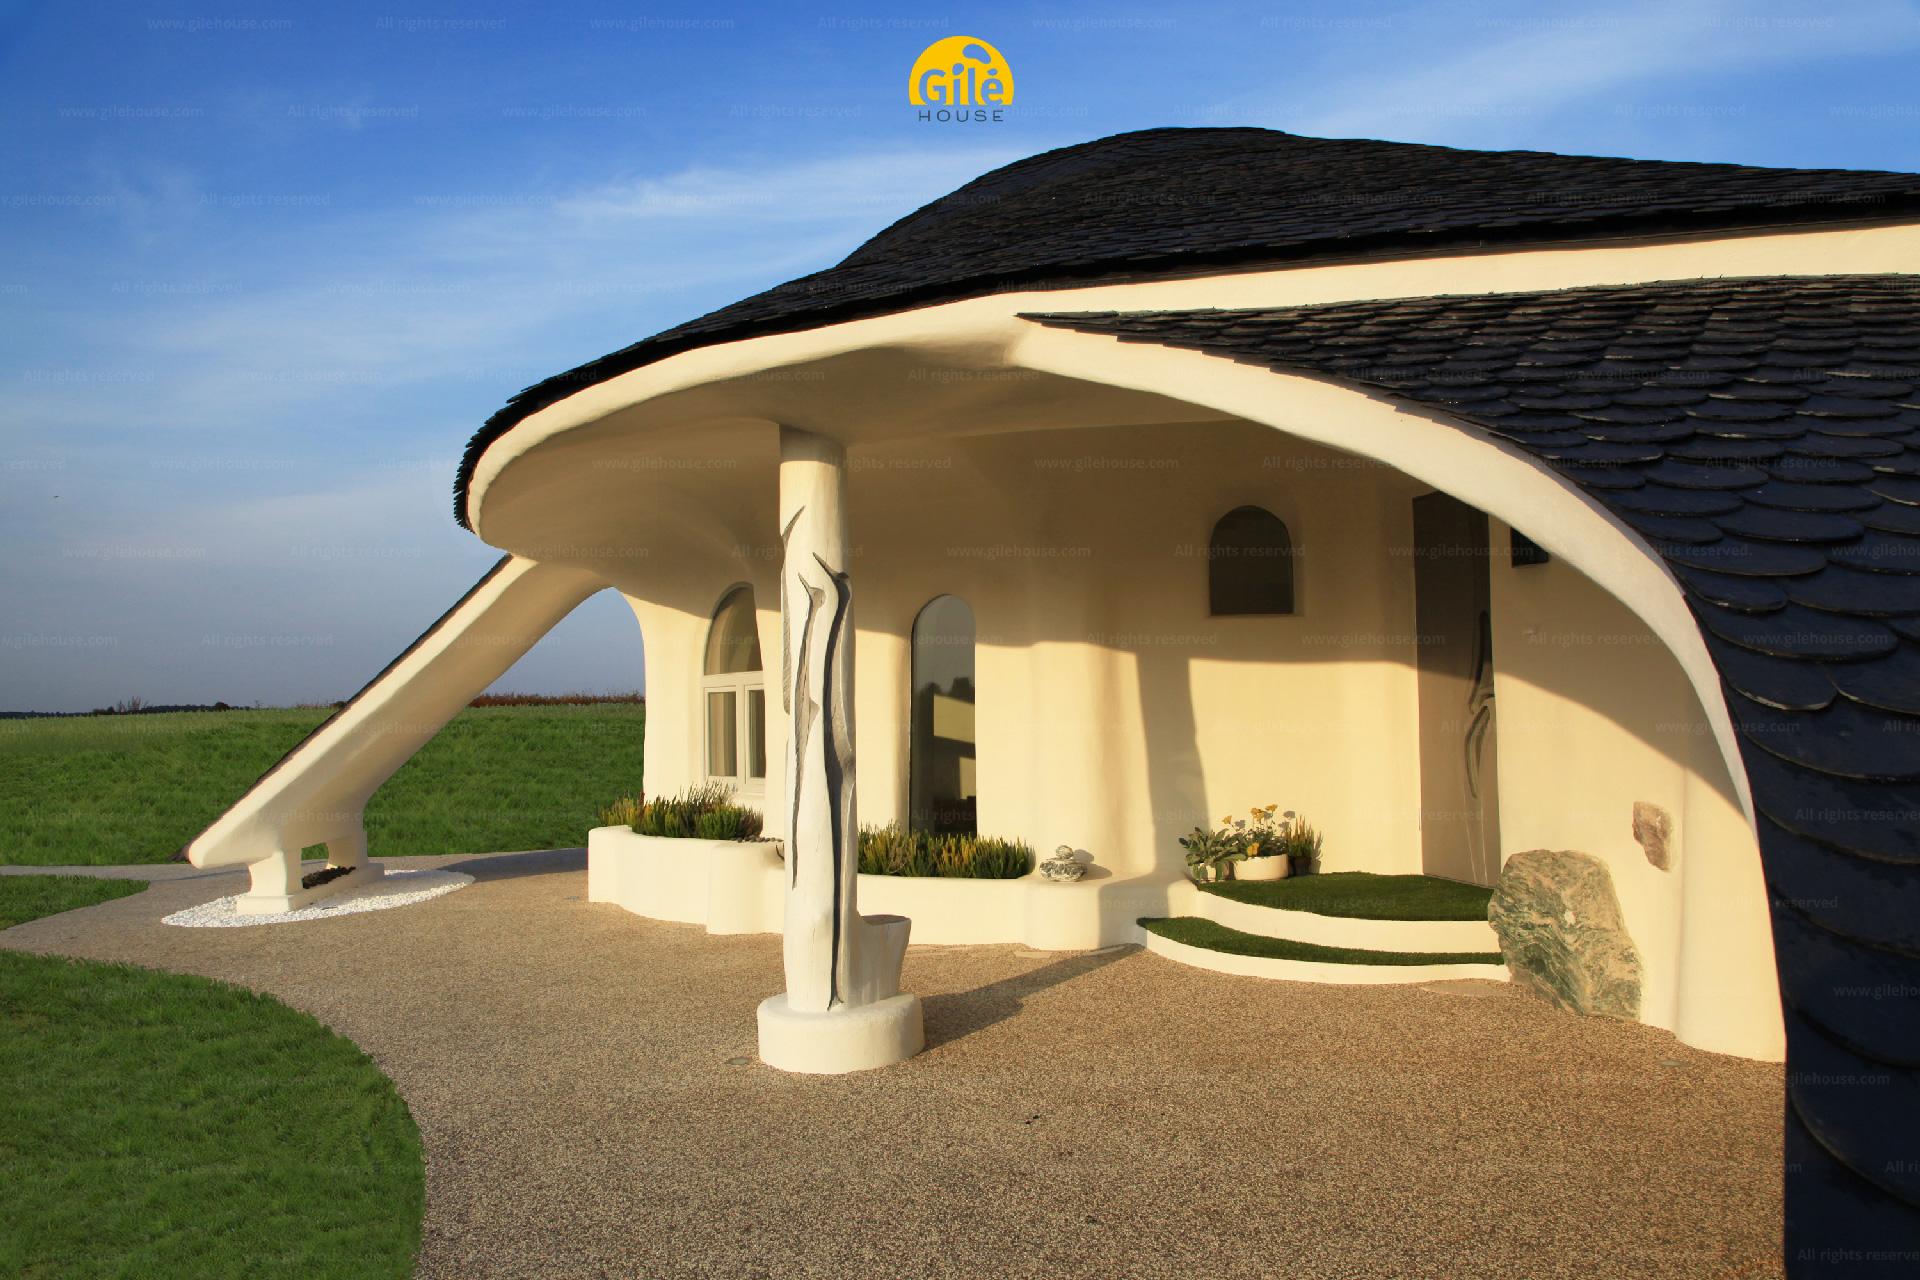 organic-architecture-biodesign-gilehouse